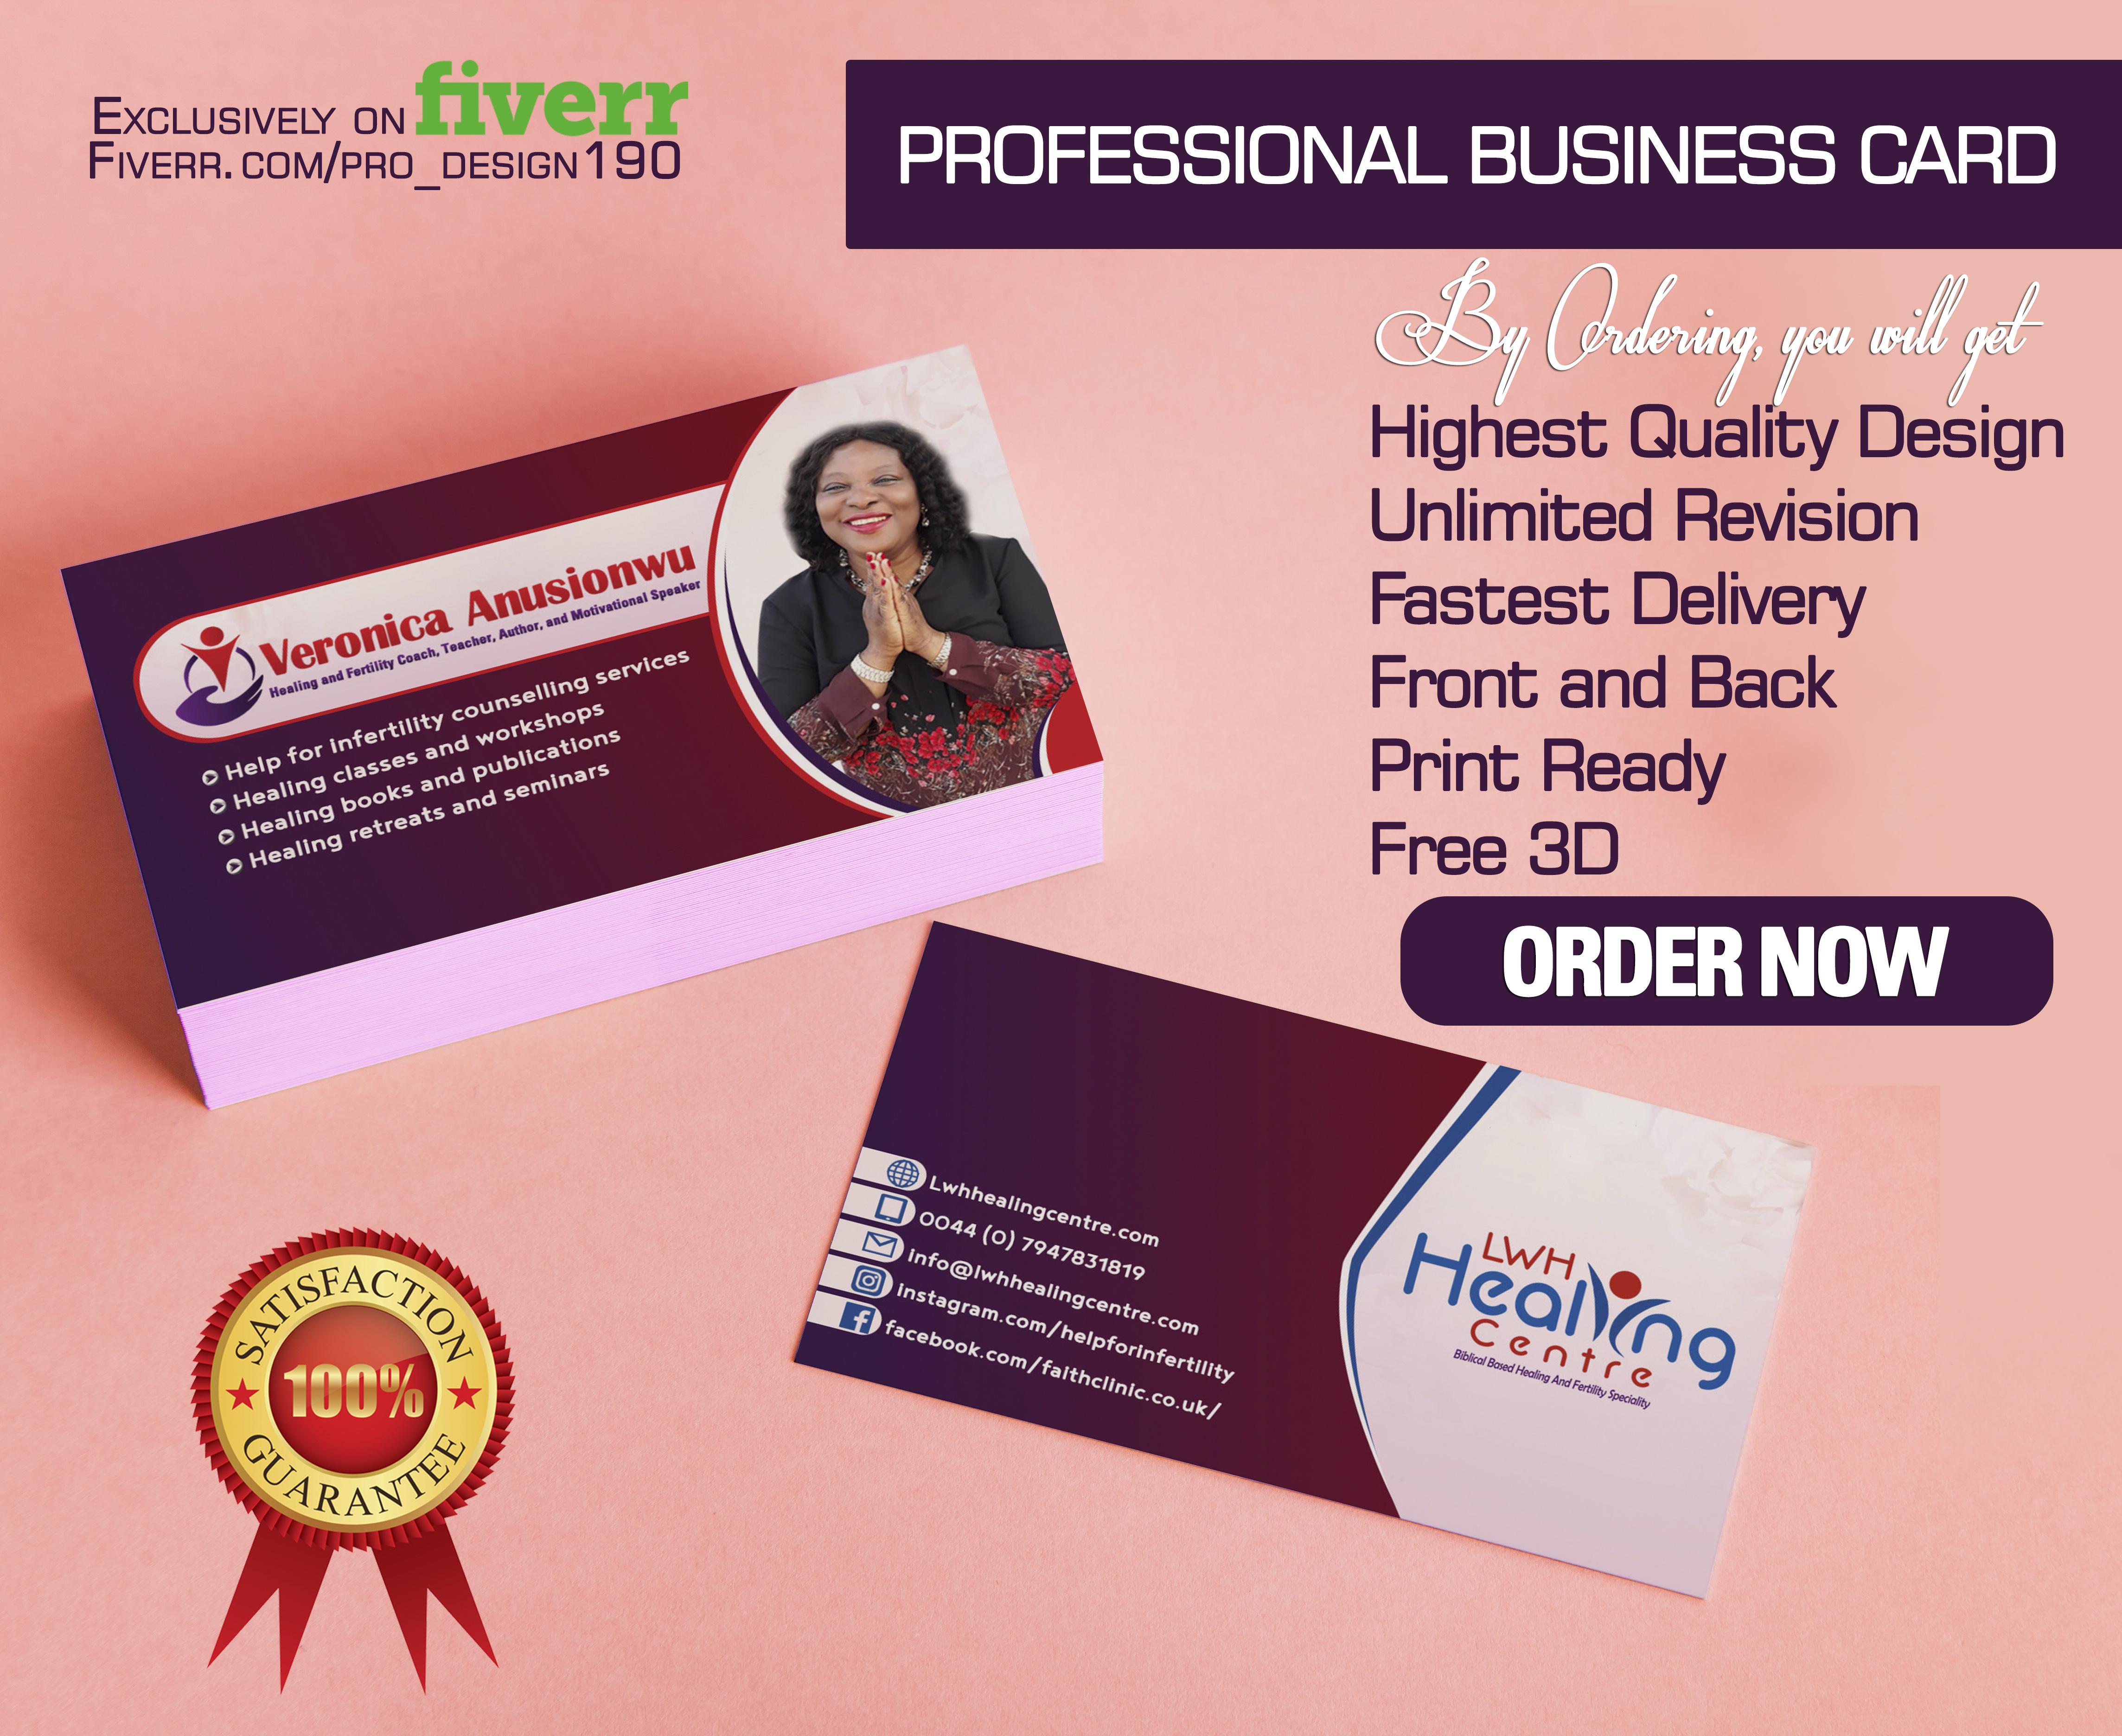 Design professional business card design by prodesign190 colourmoves